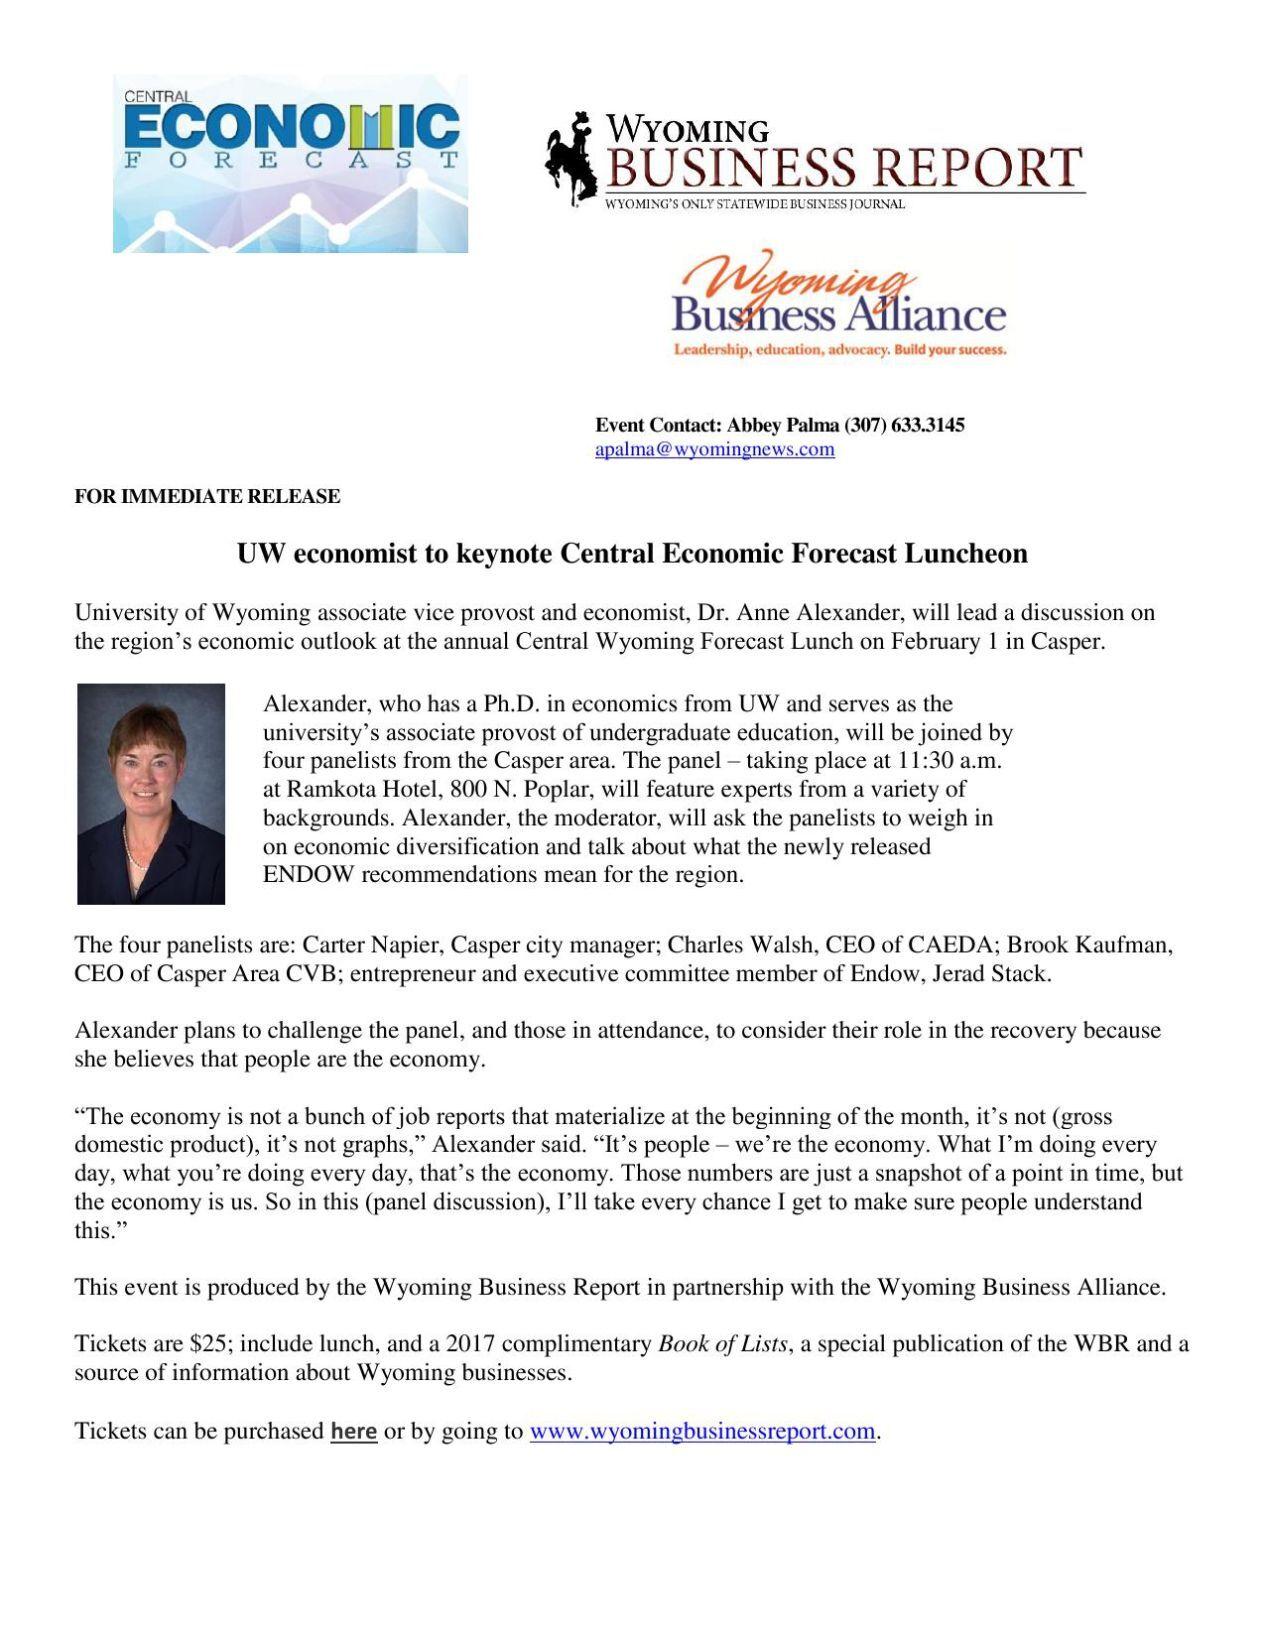 Central Economic Forecast Press Release